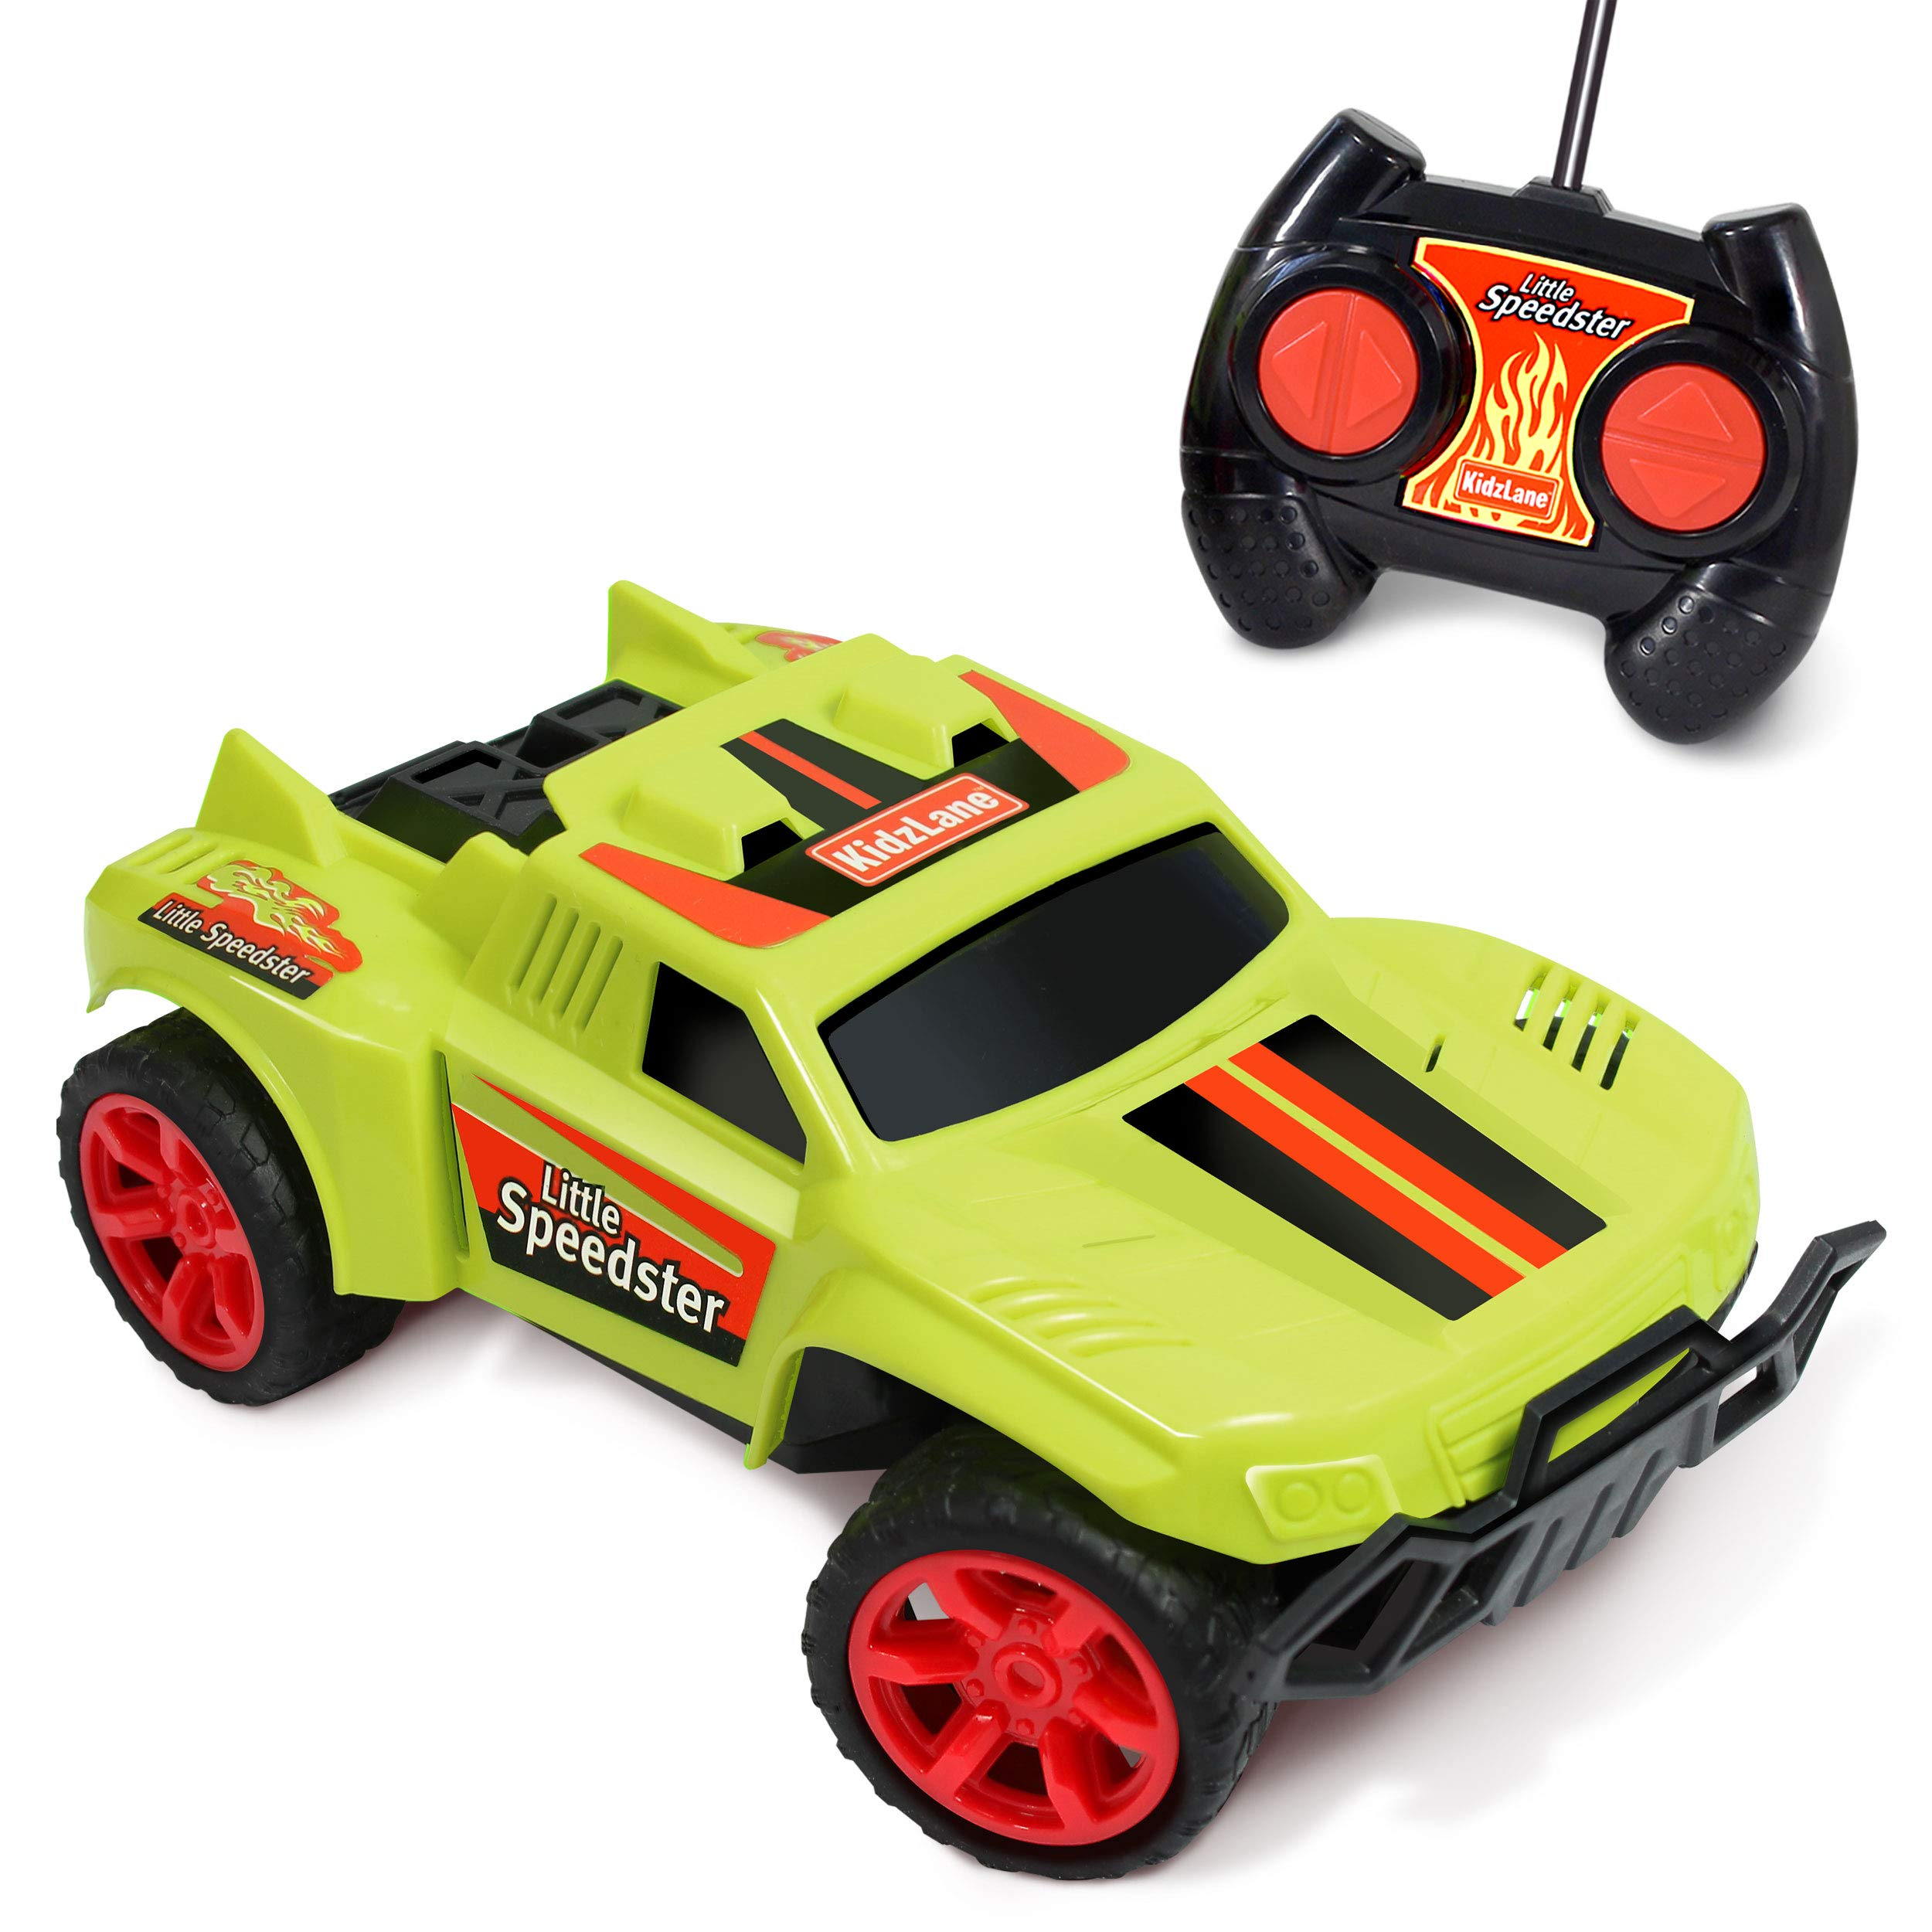 Juguetes Rc Sqtrhd Toy Control Para Ninas Carros Remoto Electricos Ninos tQCrhxsd